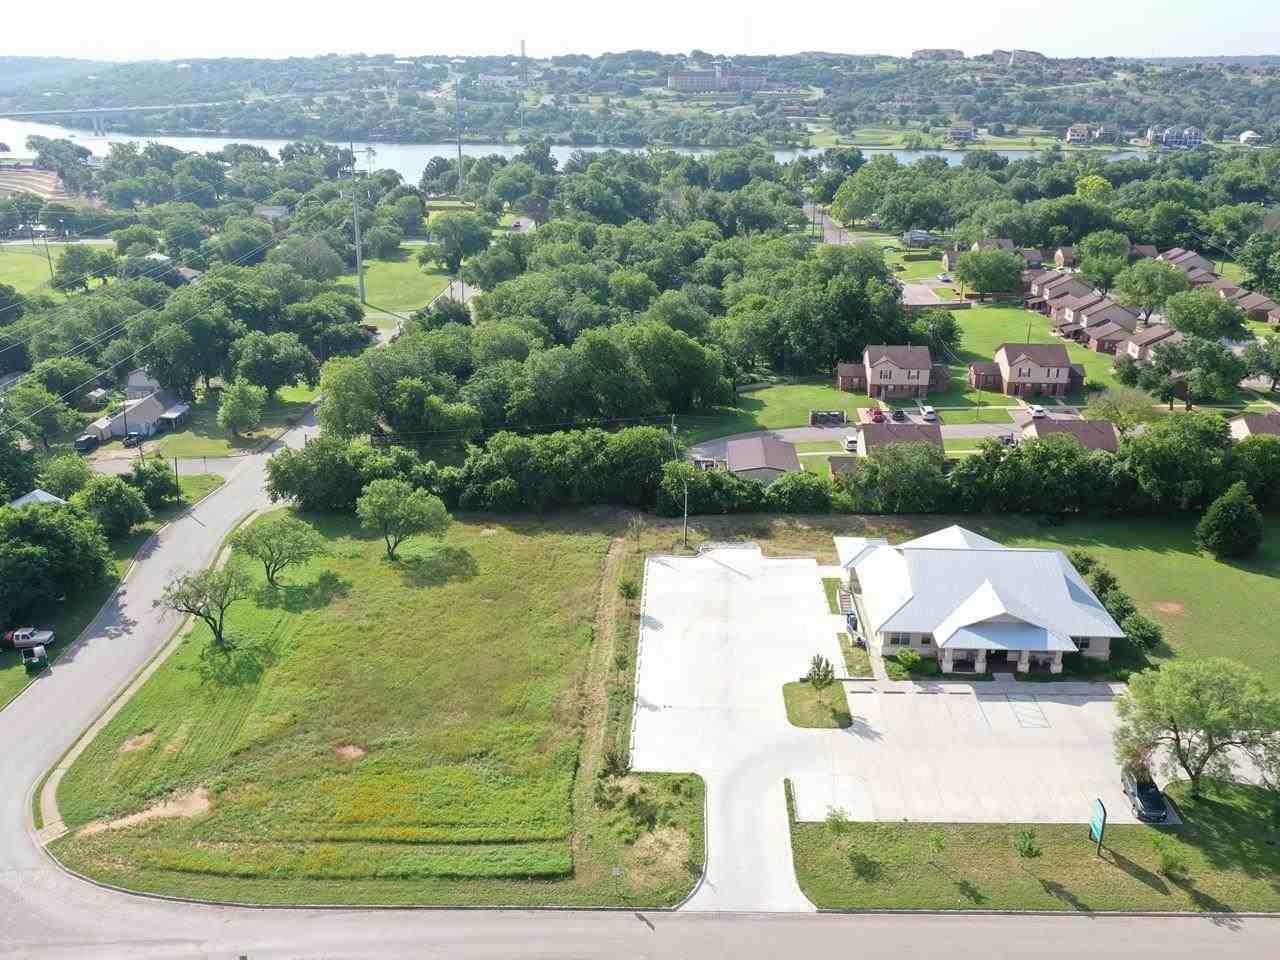 Lot 1233-A Meadowlakes Drive - Photo 1